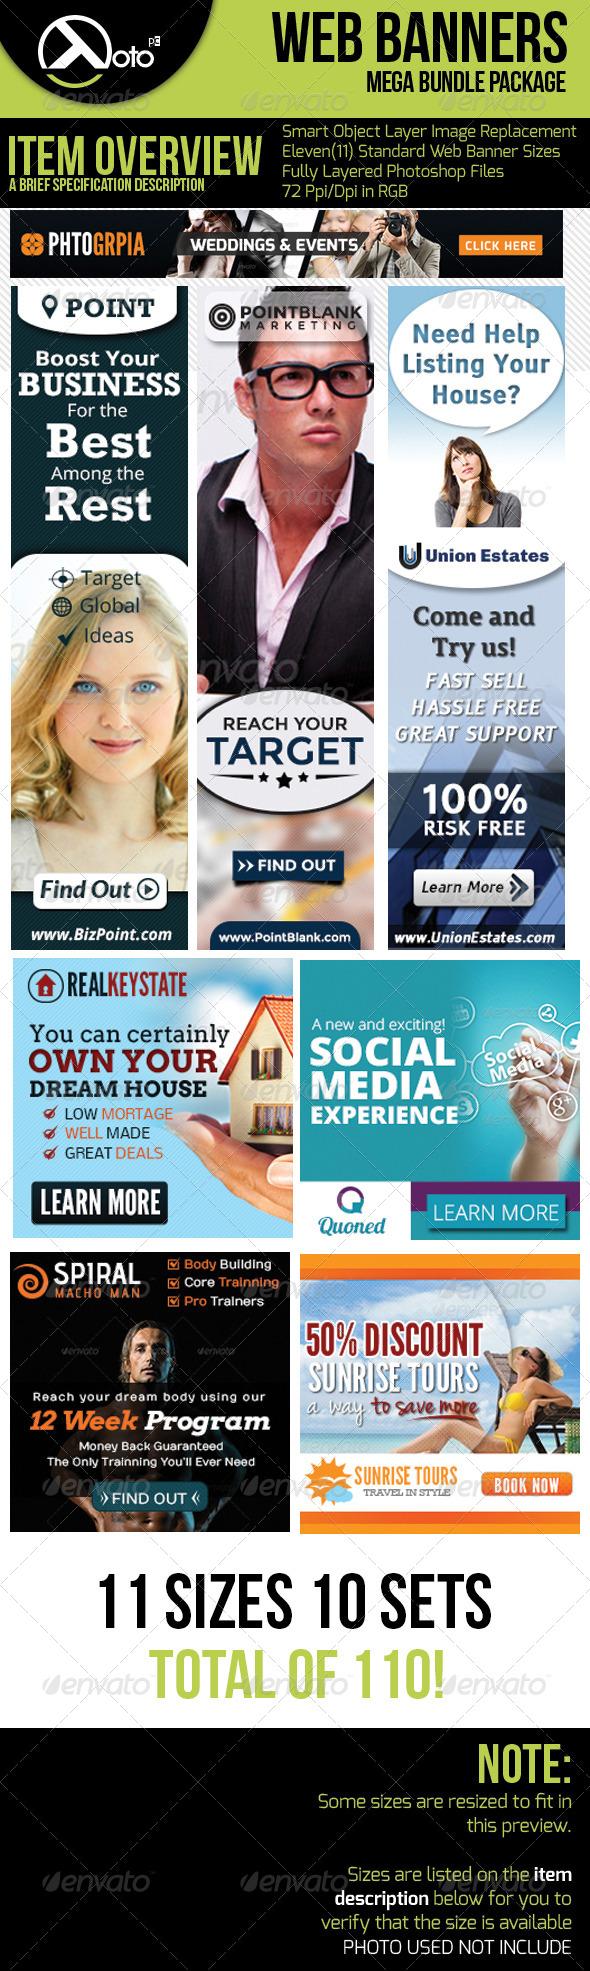 10 Set Mega Bundle Mix Web Banners Vol 2 - Banners & Ads Web Elements